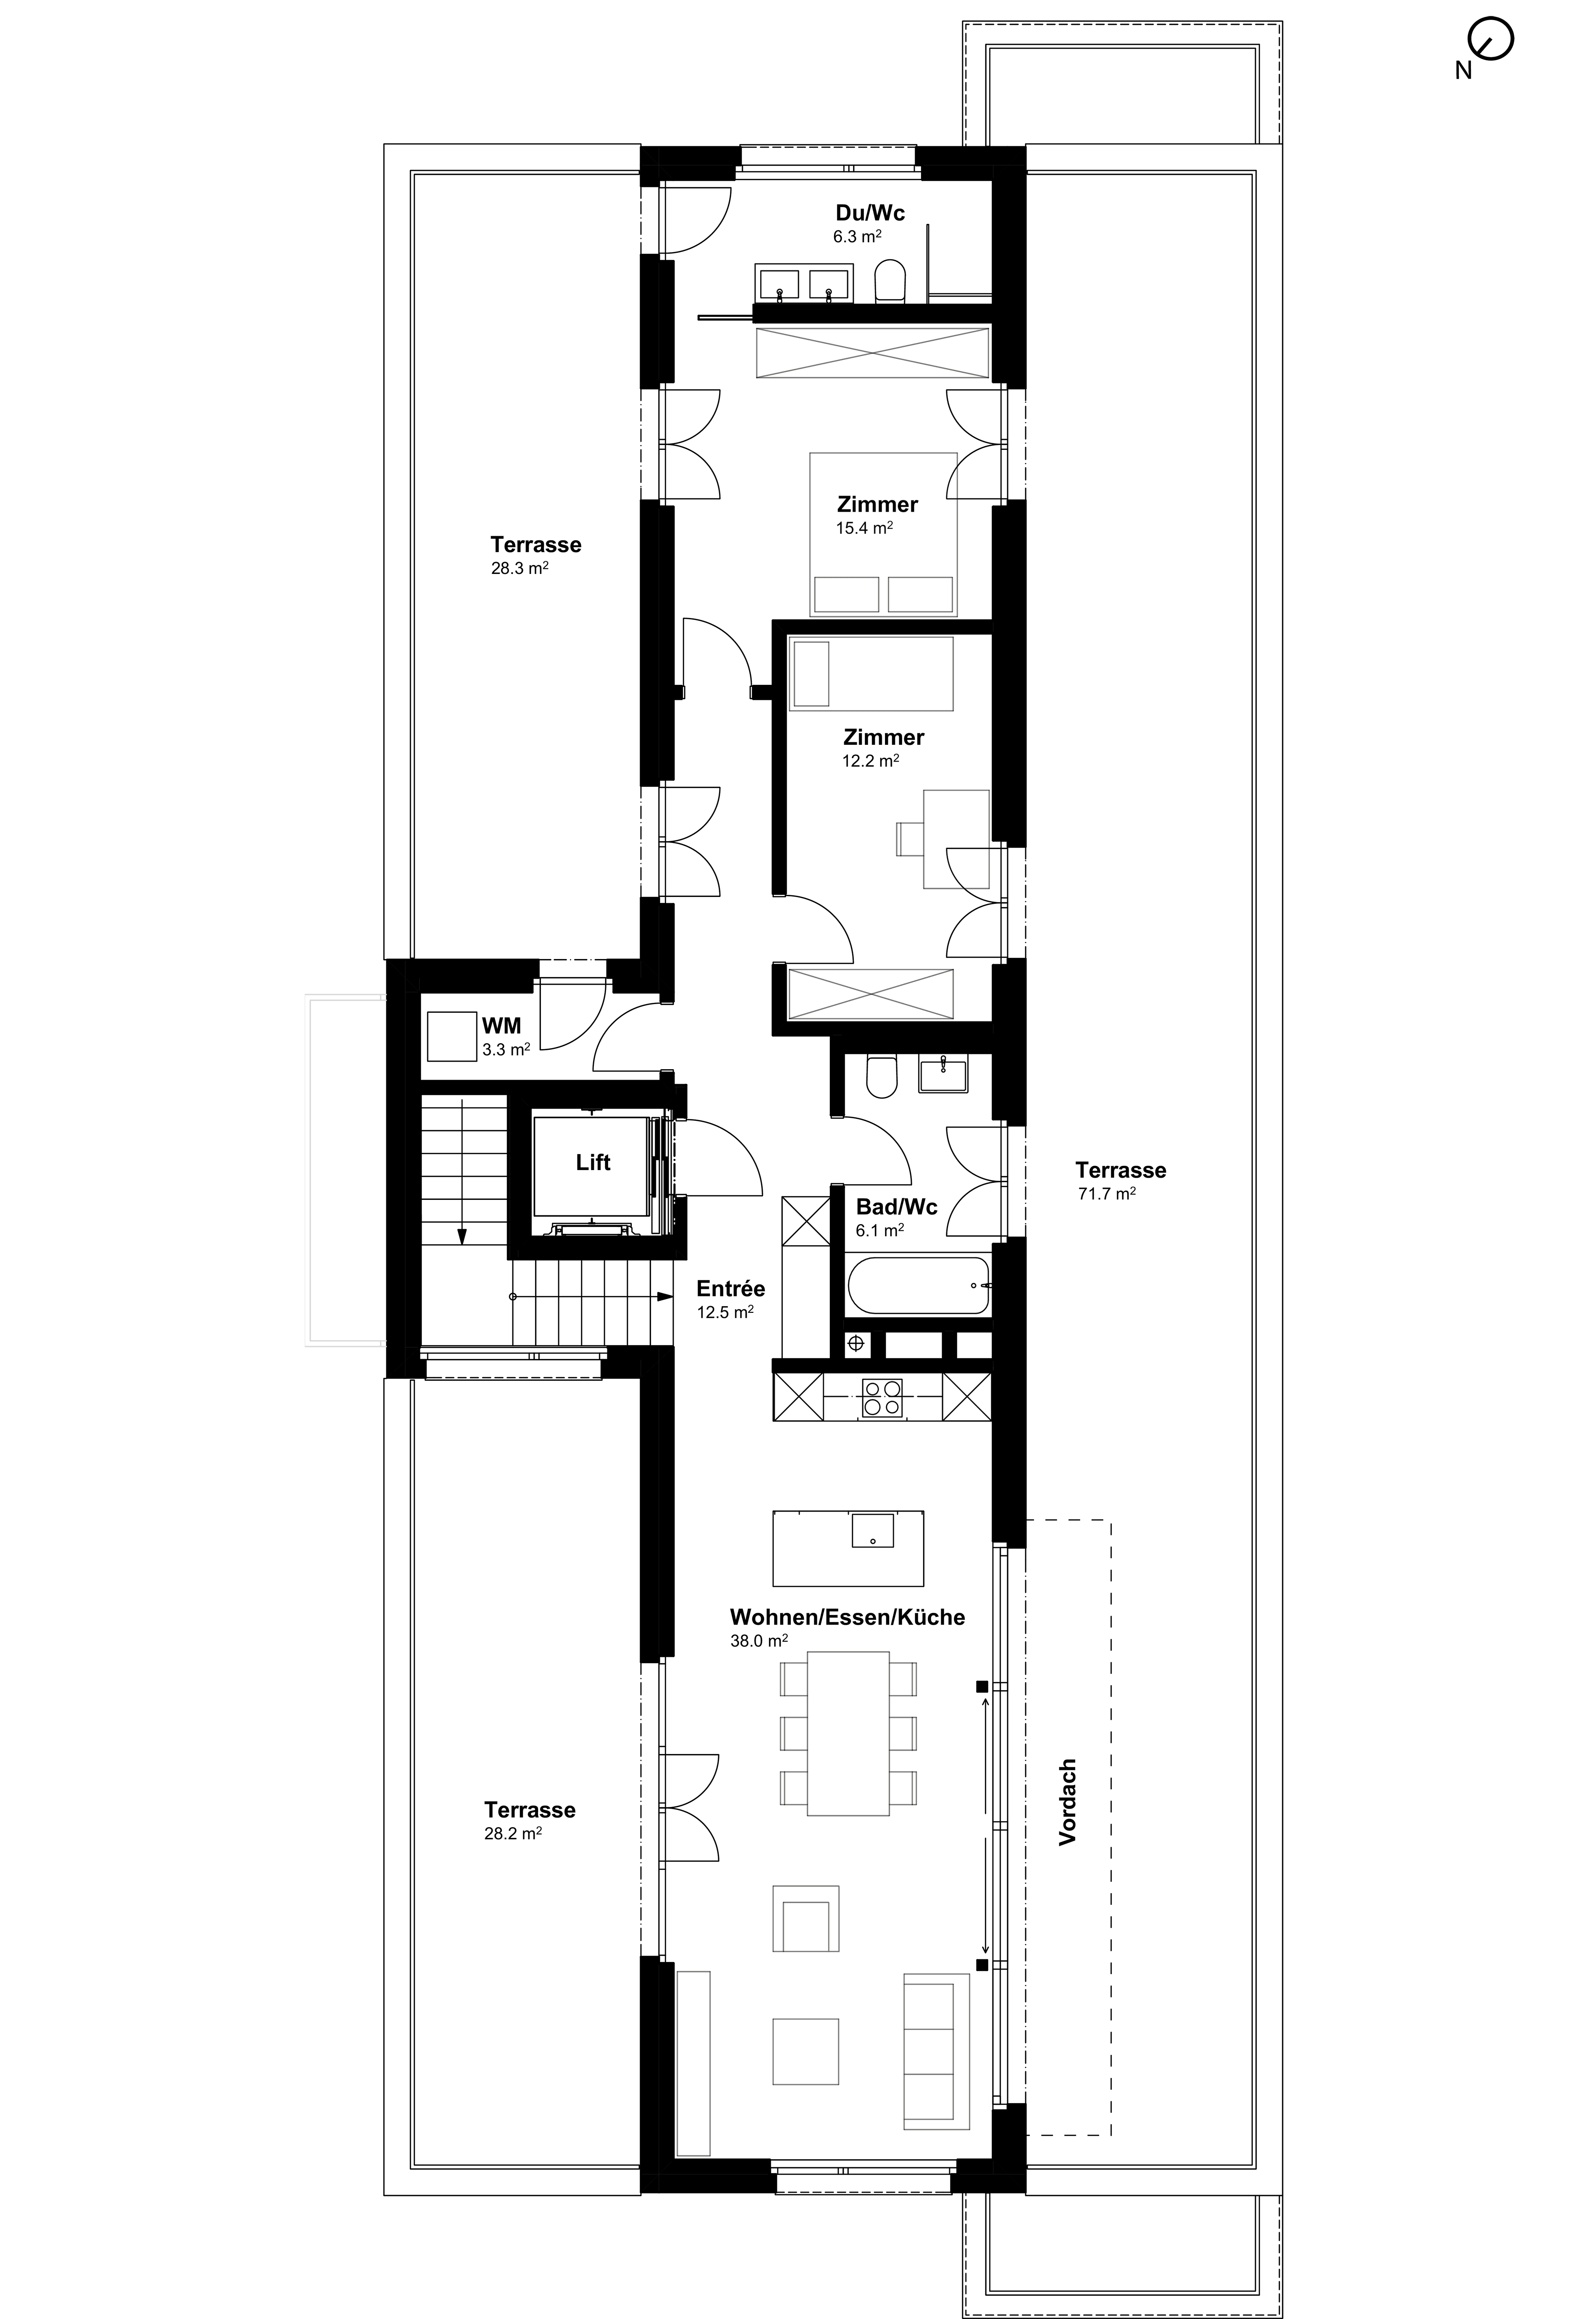 E21 - murgau – Dabei sein wo neues entsteht.